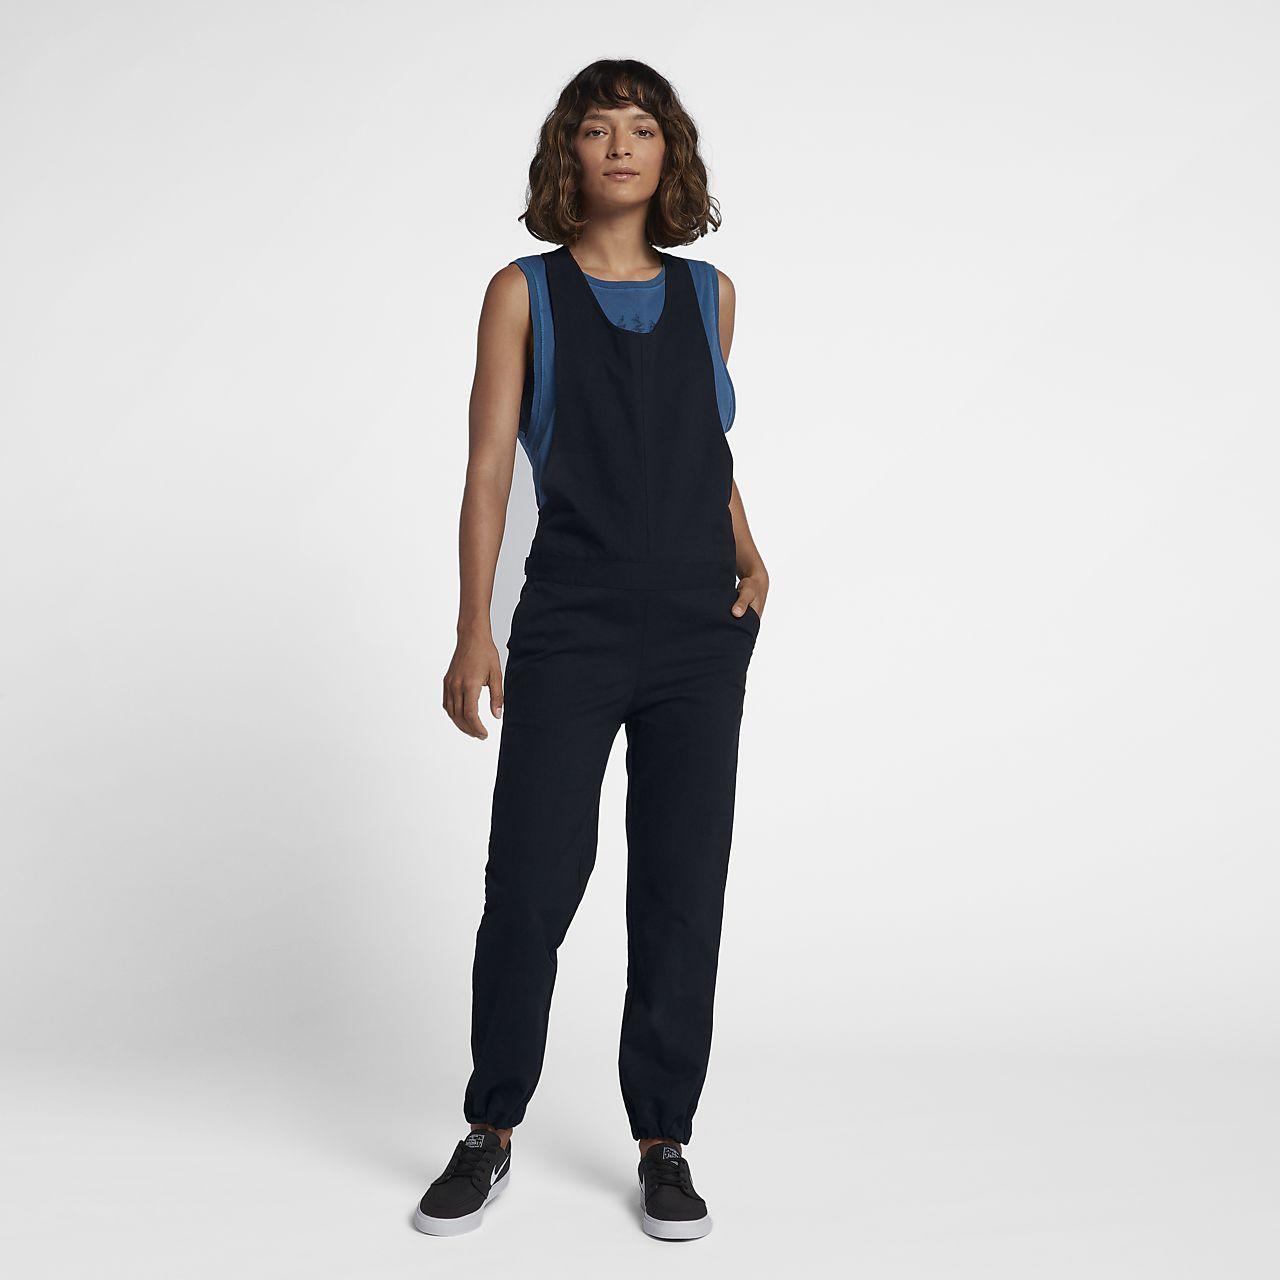 6fe66303c22c Low Resolution Hurley Modernist Women s Jumpsuit Hurley Modernist Women s  Jumpsuit